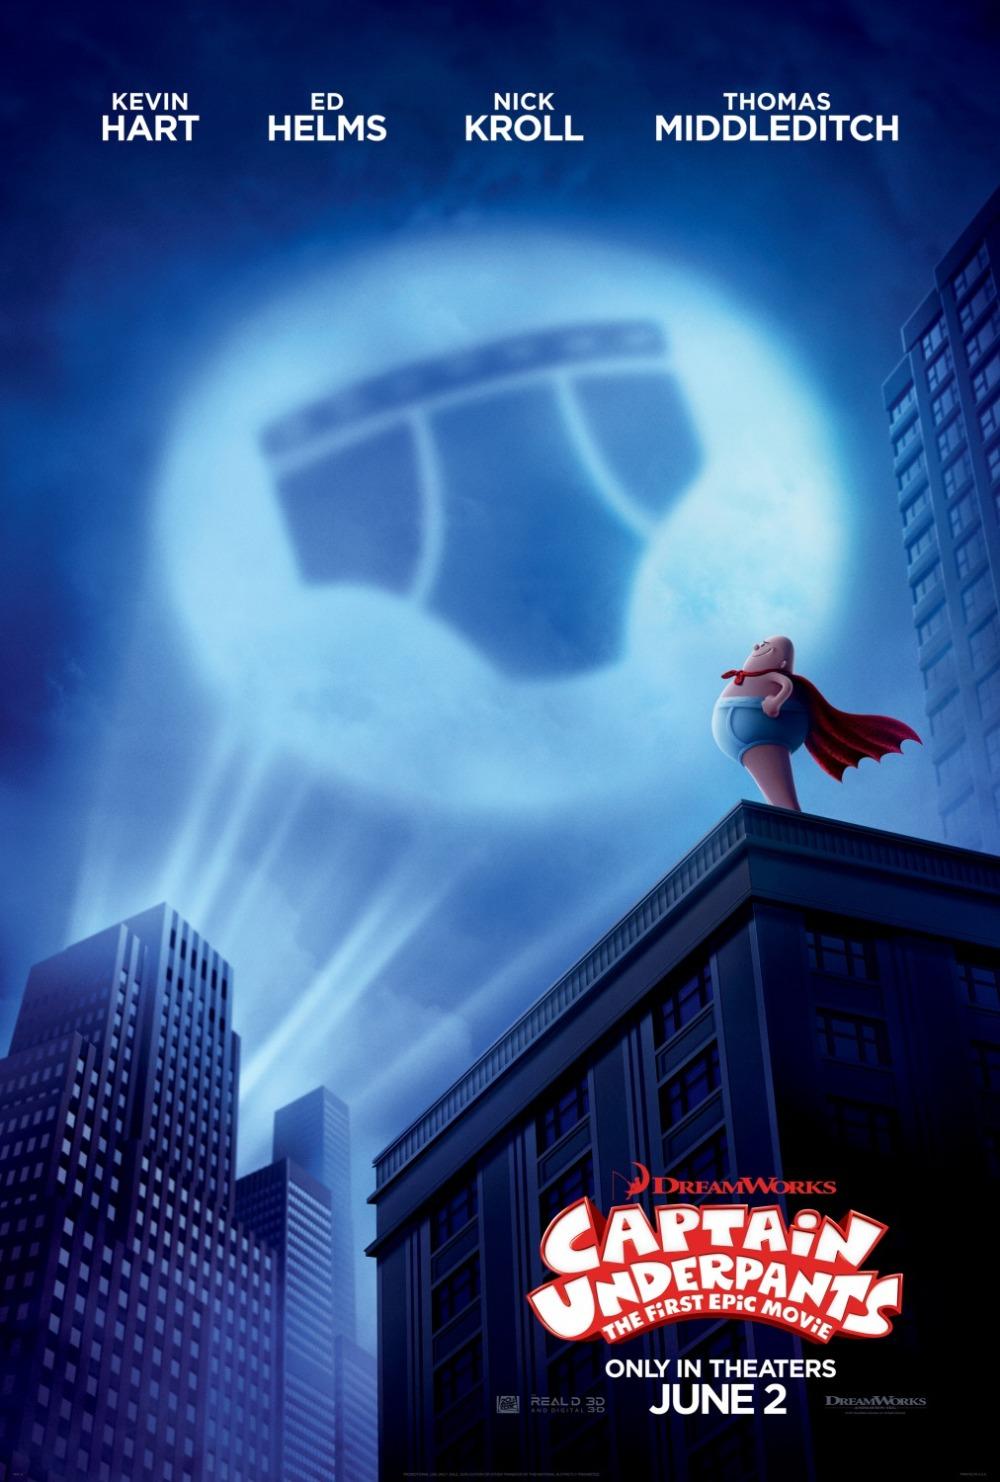 Captain Underpants movie poster